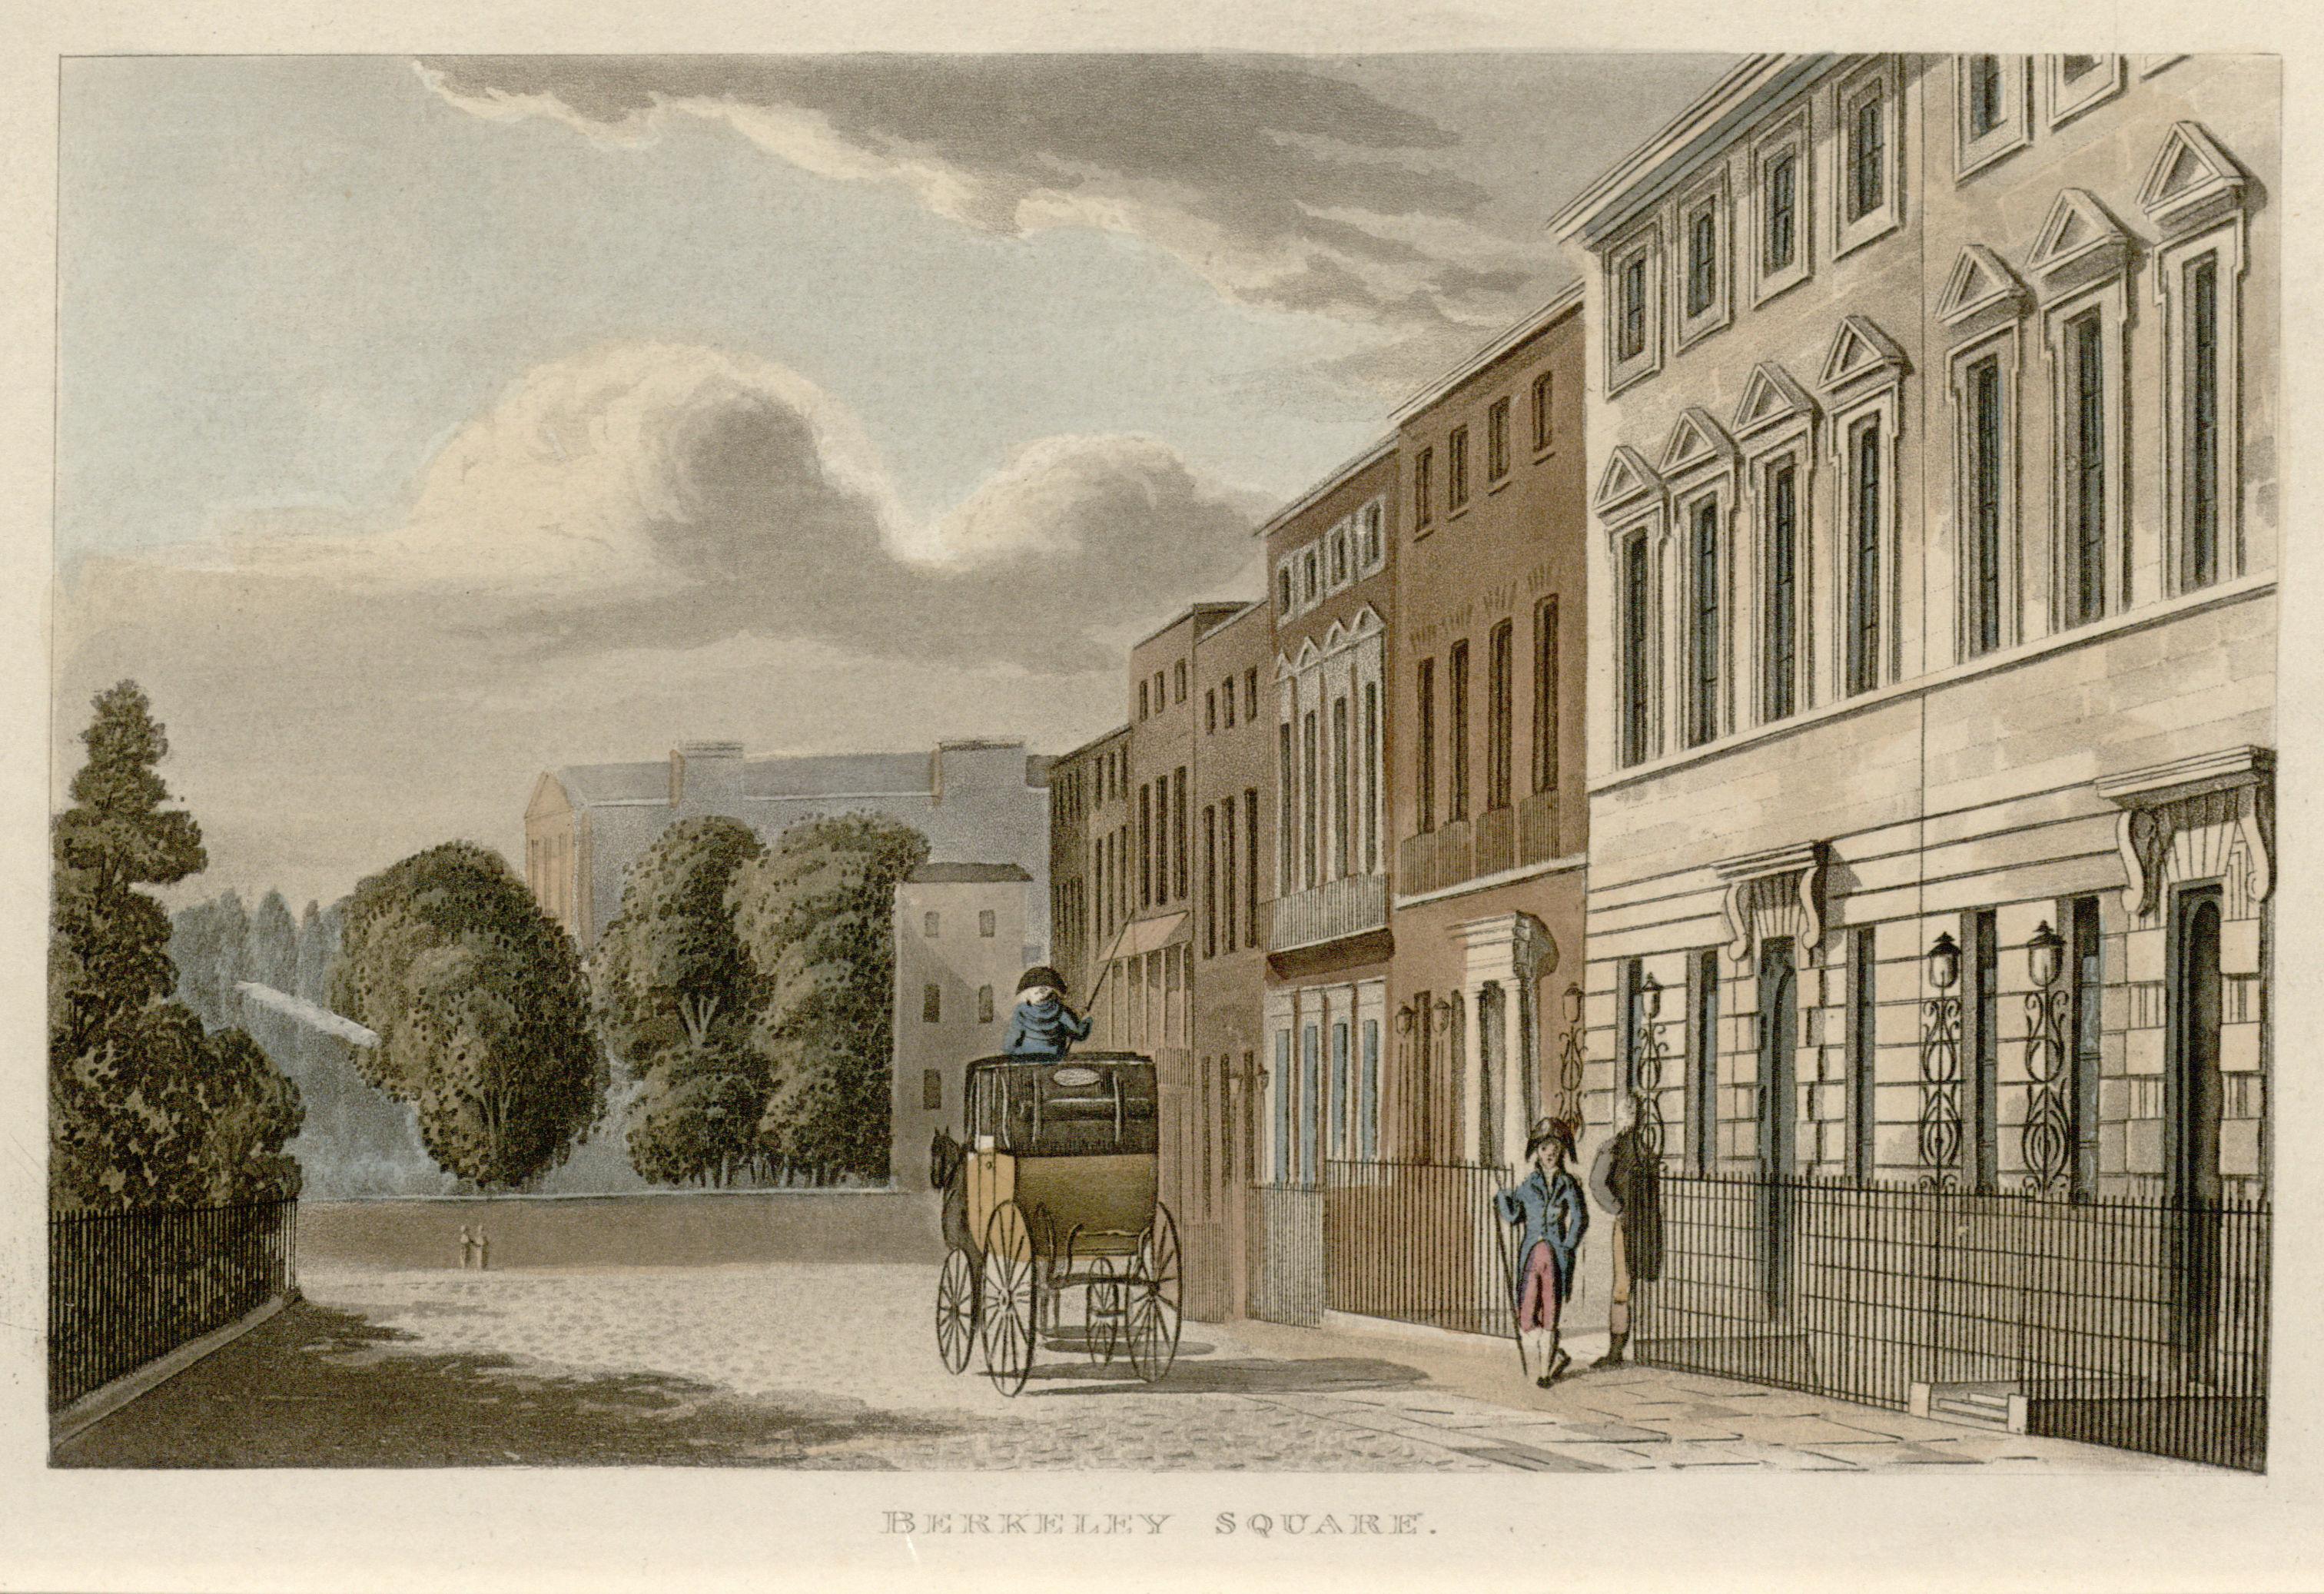 17 - Papworth - Berkeley Square